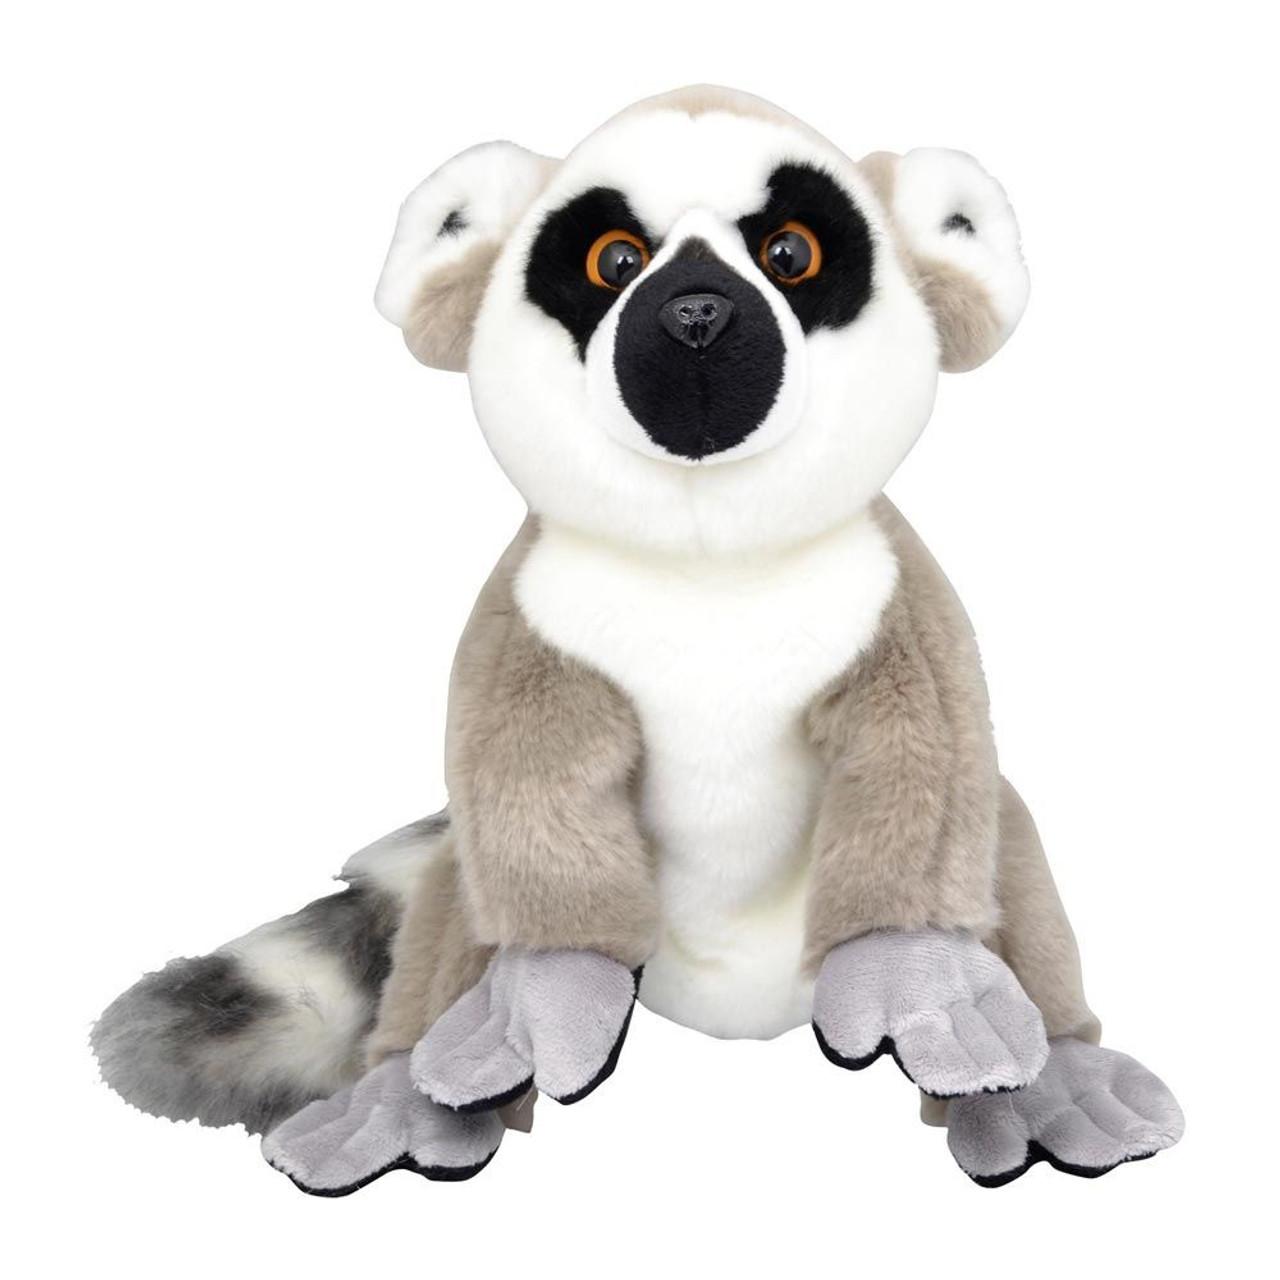 Korimco Wildlife Body Puppet 32cm LEMUR at Baby Barn Discounts